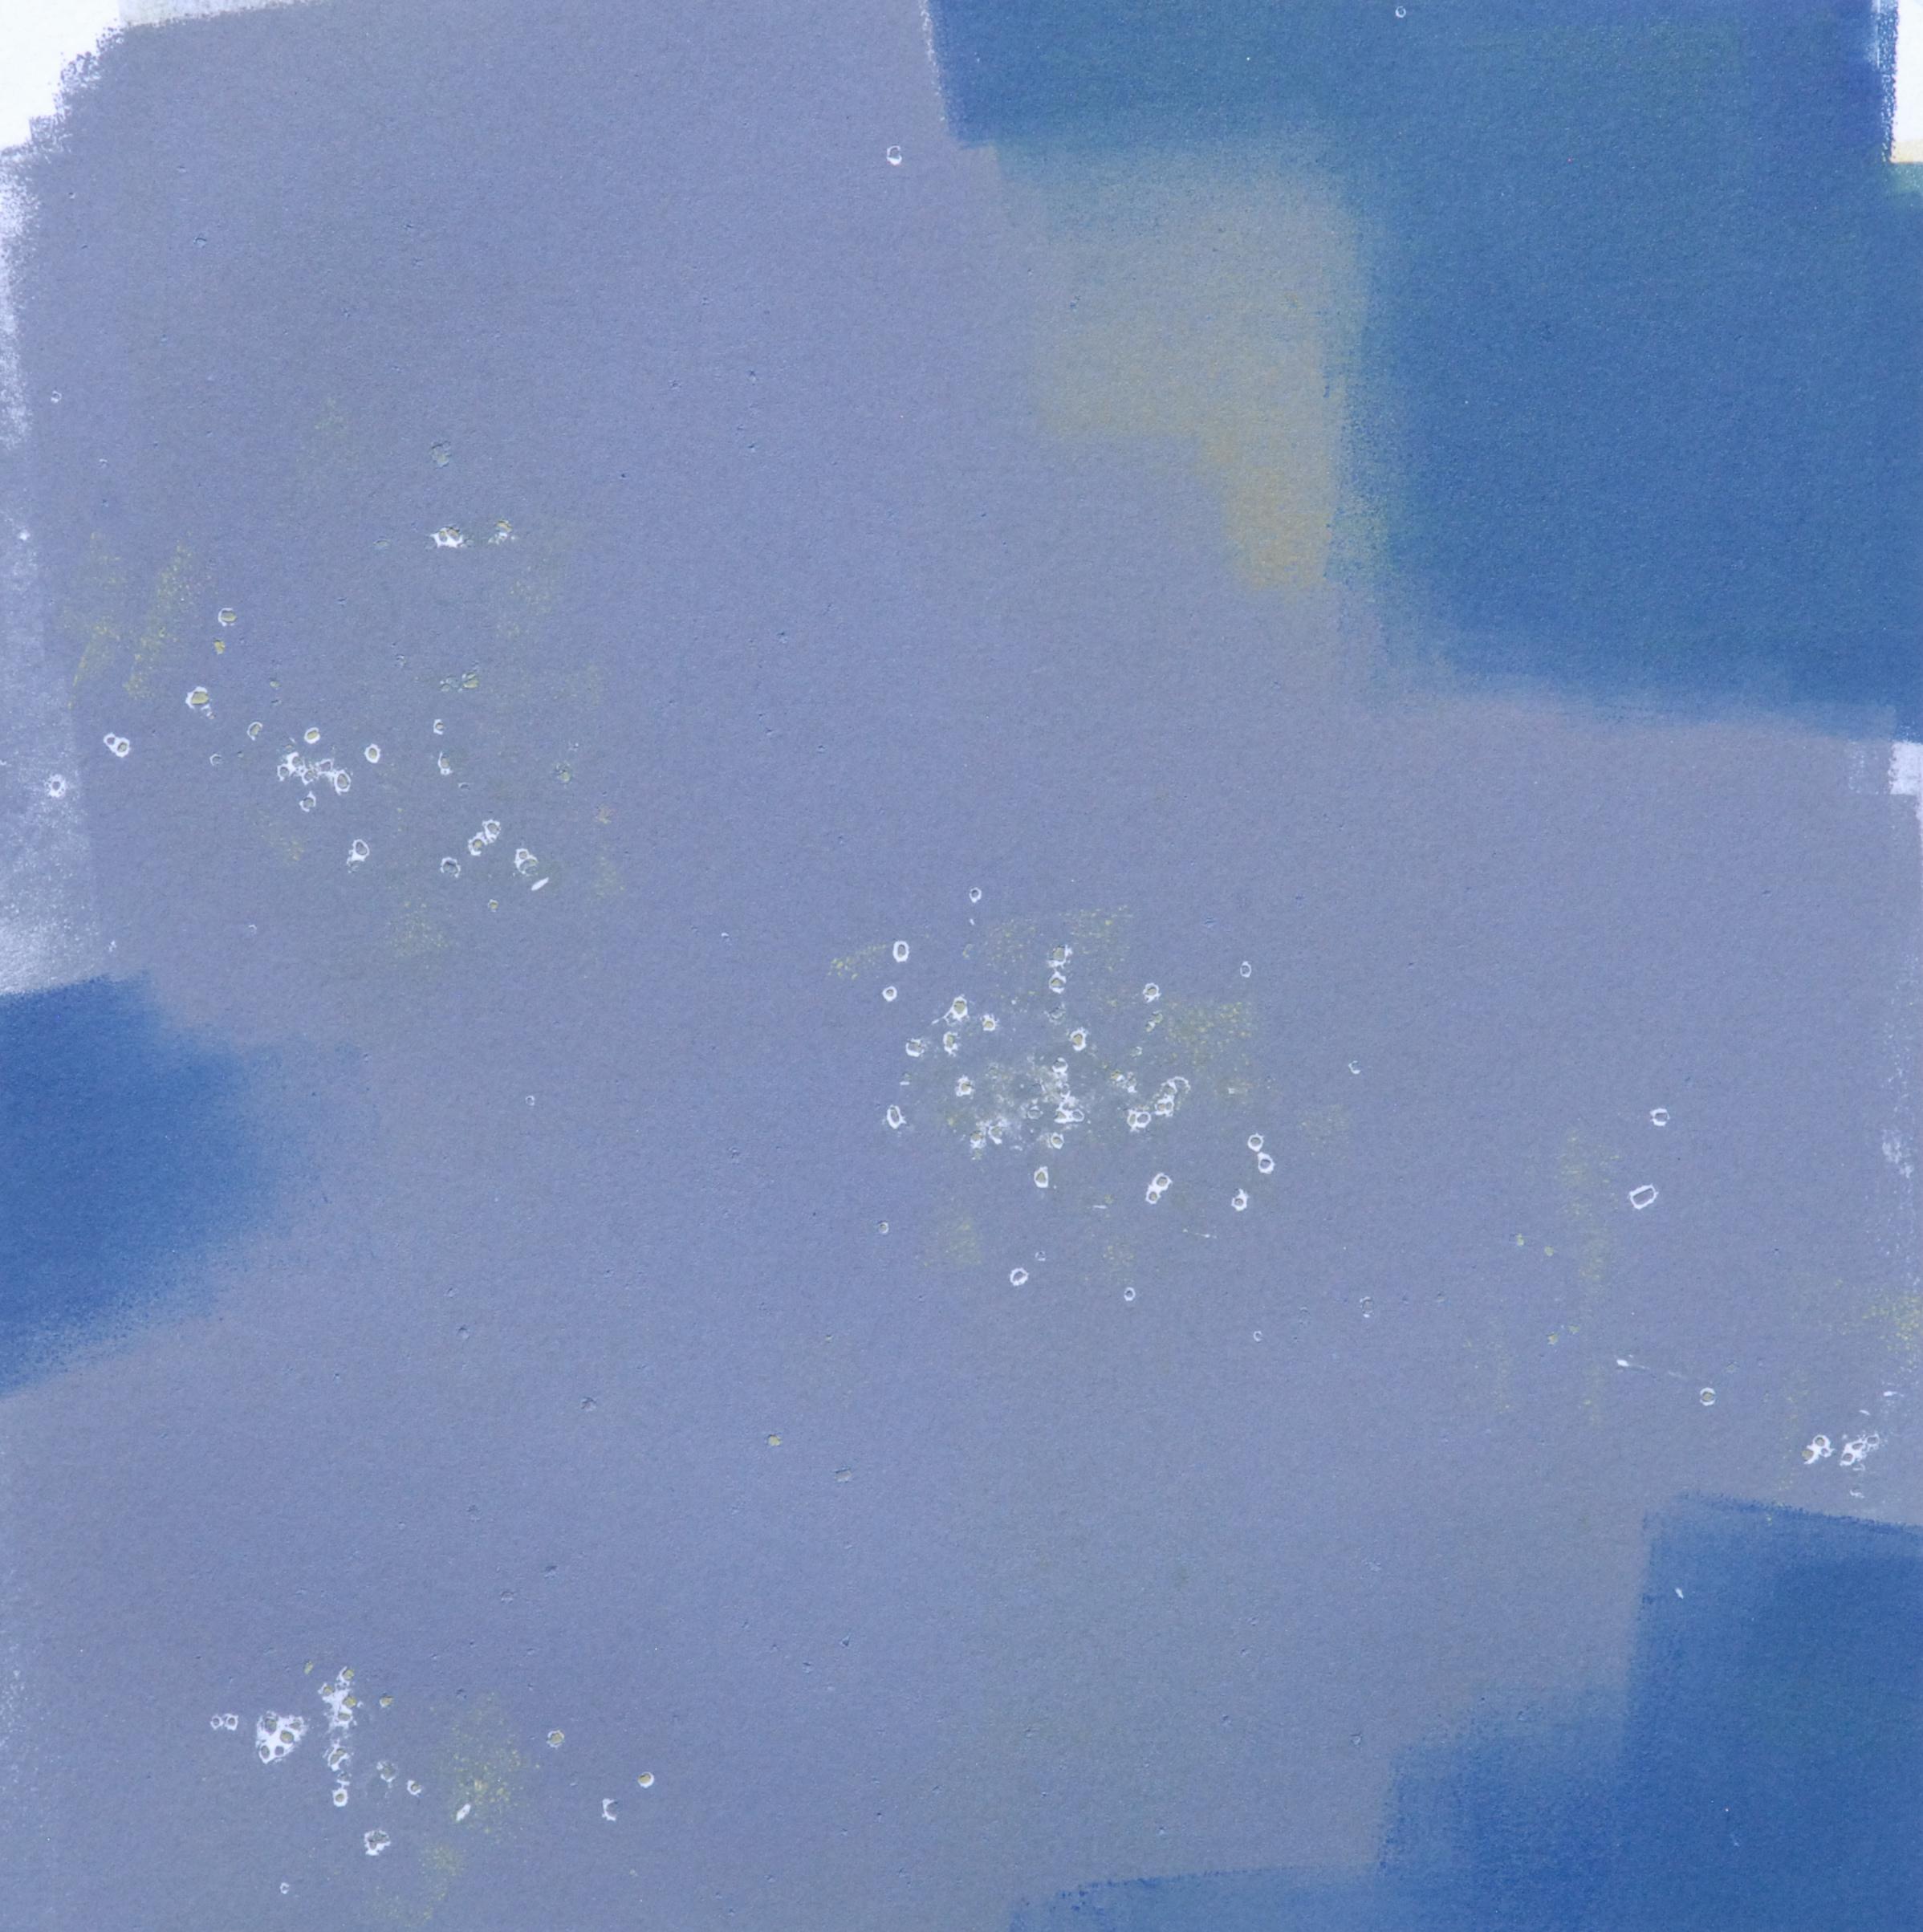 "Sodium Deviation 14, 2016  monoprint  10"" x 10"" image on 11"" x 14"" paper"